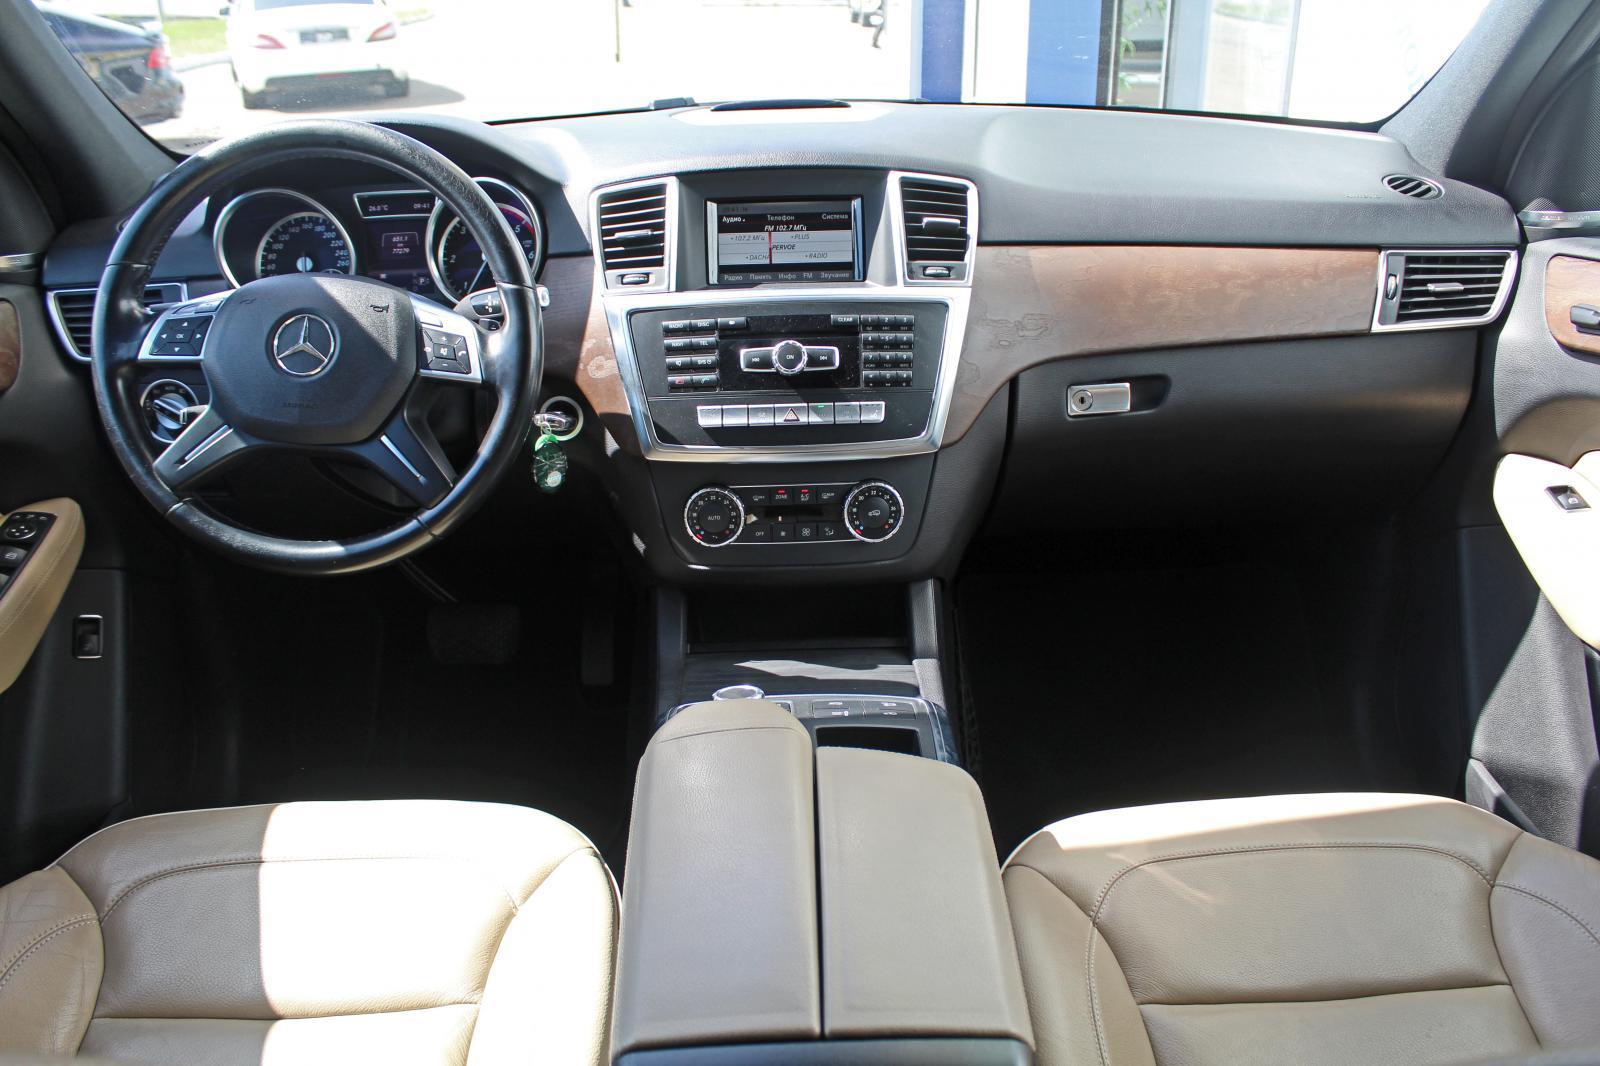 Mercedes-Benz M-Класс, III (W166) 2013г.